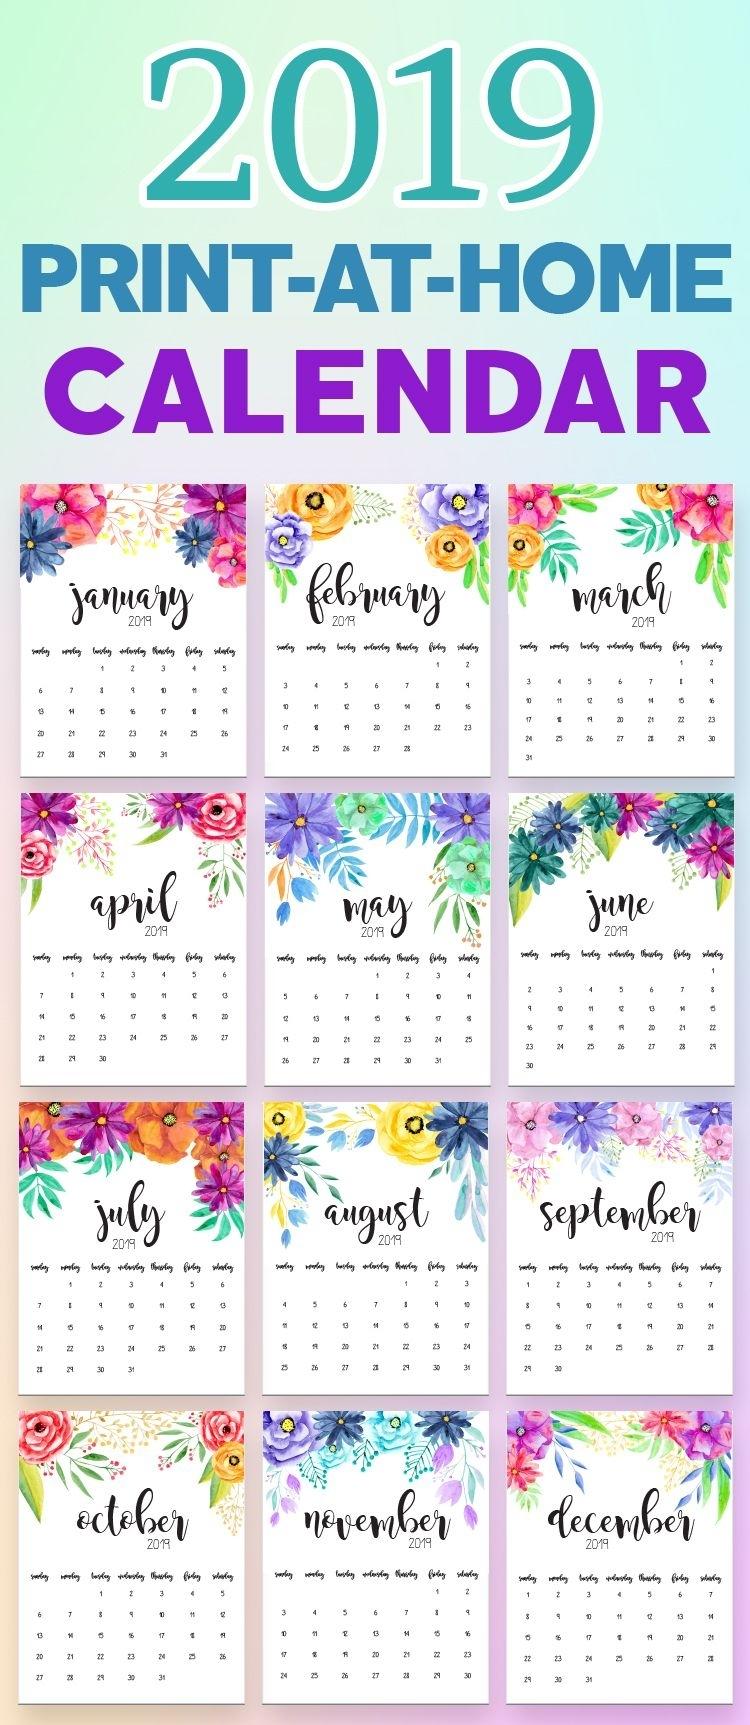 2020 Printable Calendars And Planners | Calendar